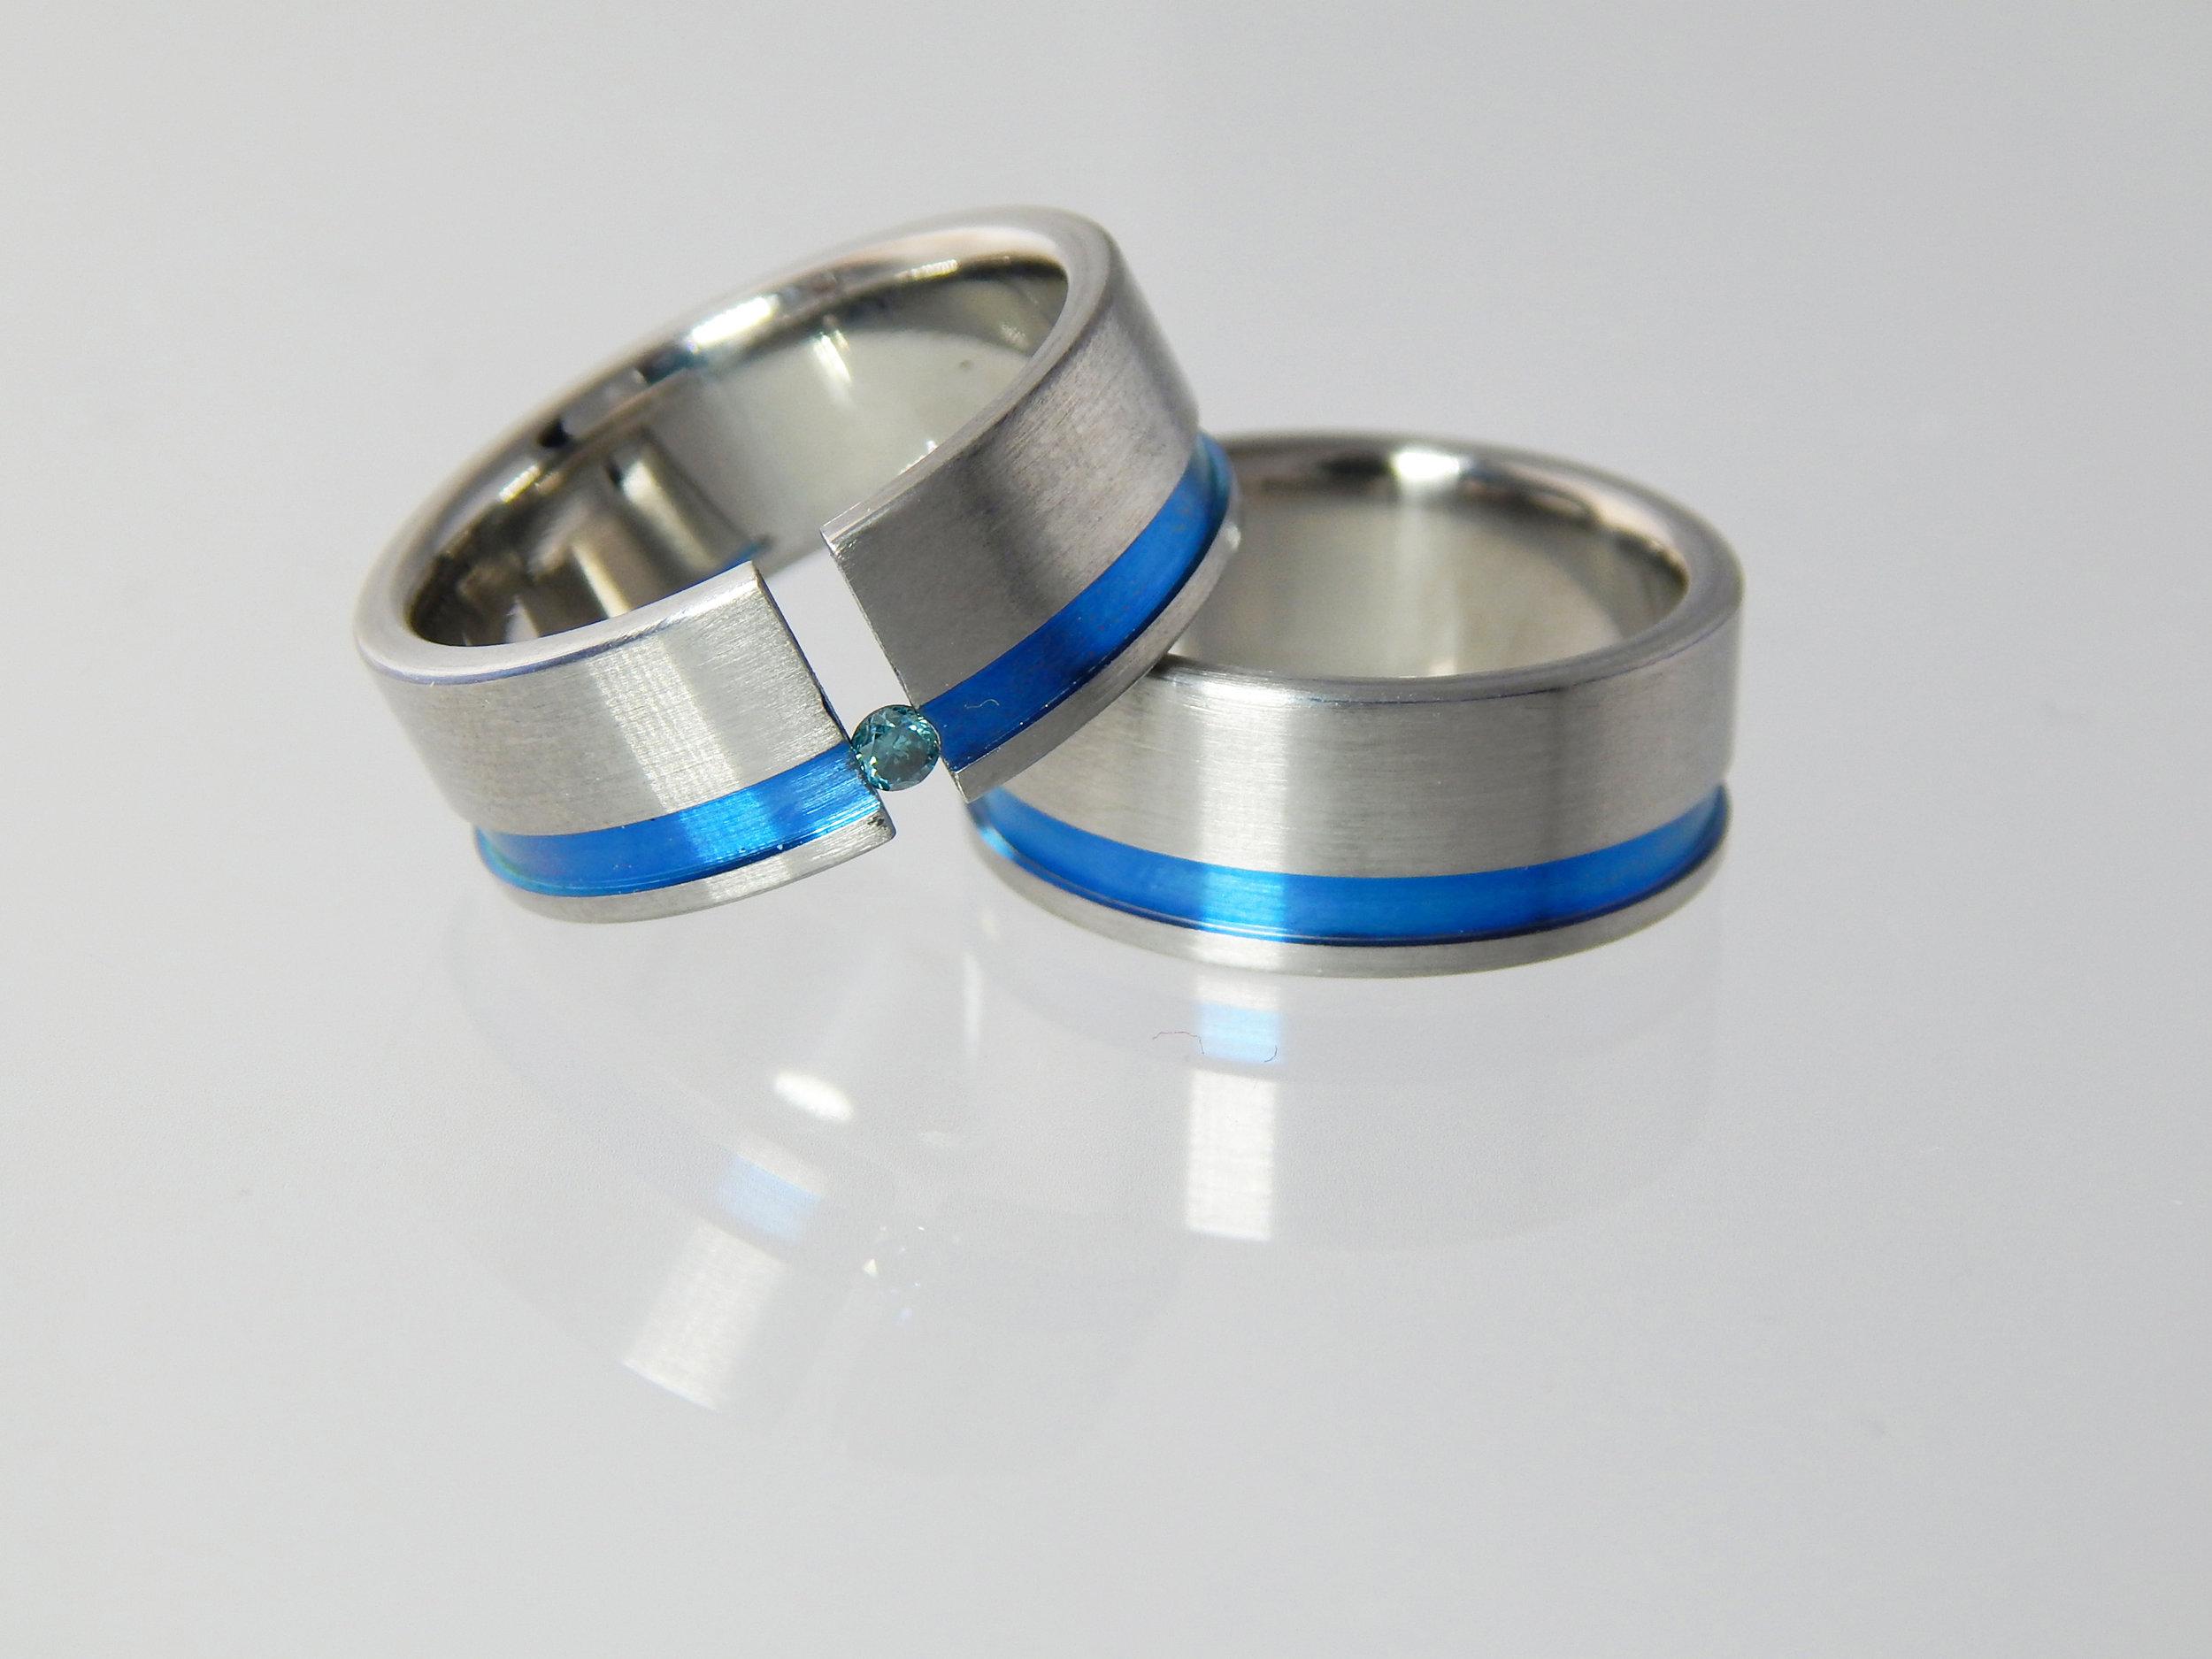 darvier-tardis-blue-tension-set-diamond-wedding-ring-set.JPG